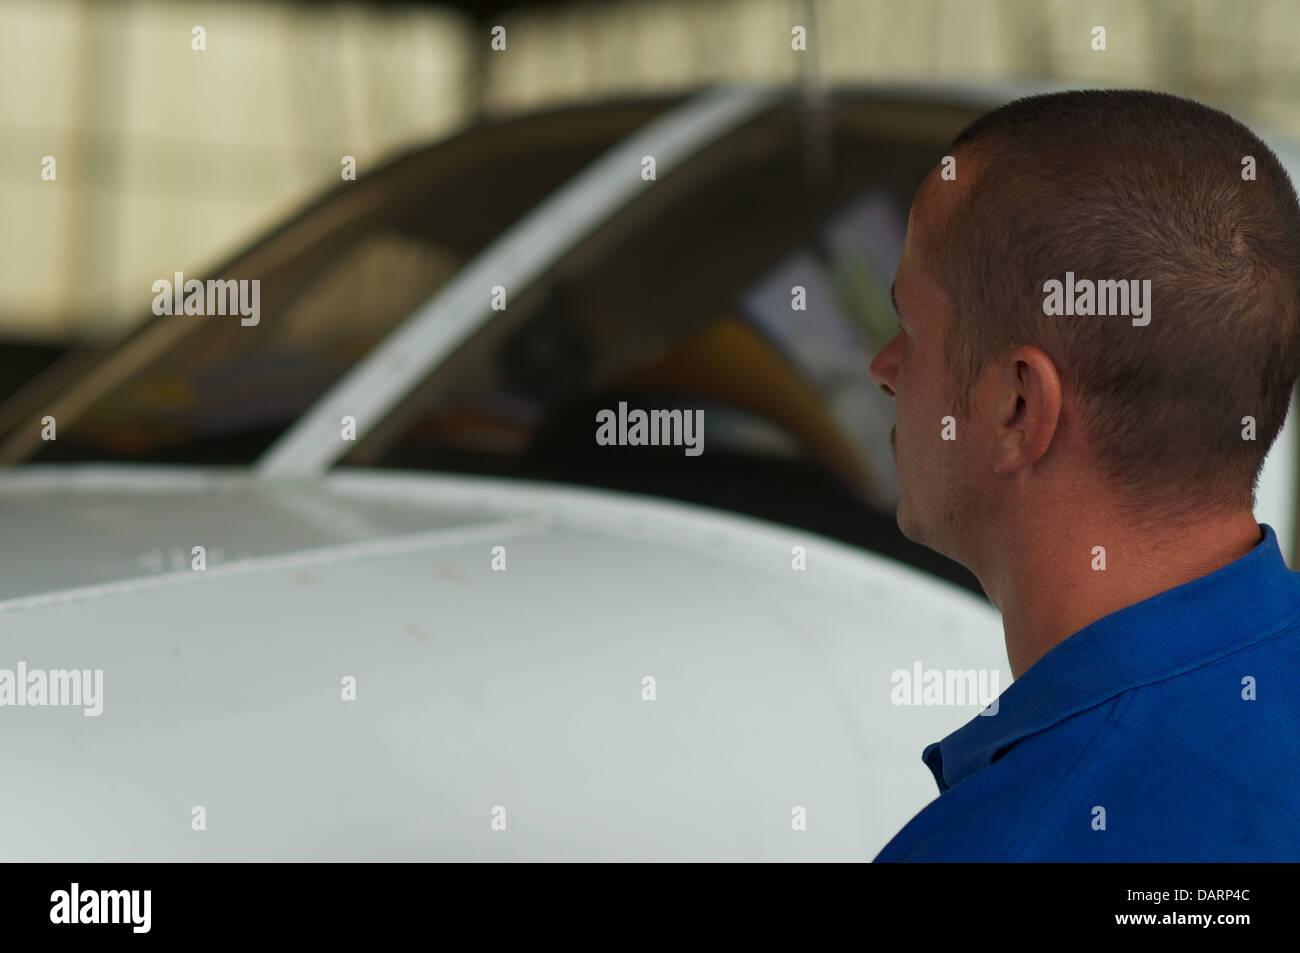 Aviation engineering - Stock Image